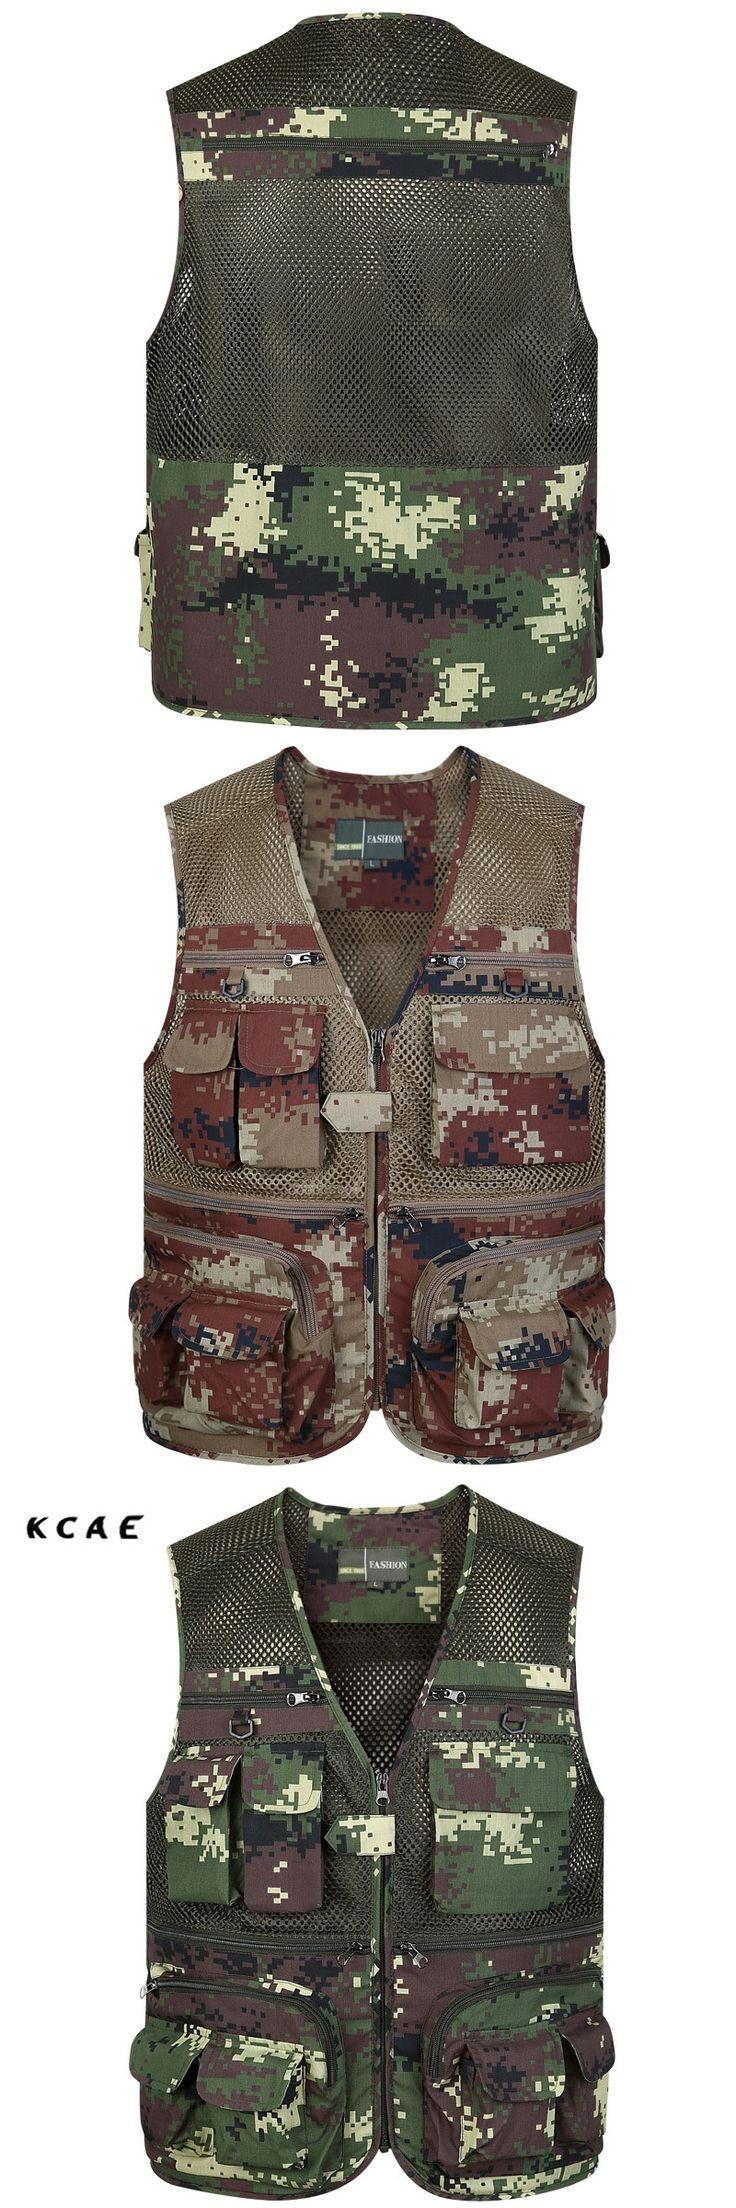 2017 New Summer Outdoors Camouflage Travels Vests Mesh Vest L-4XL Photographer Vest Shooting Vest with Many Pocket Wholesale